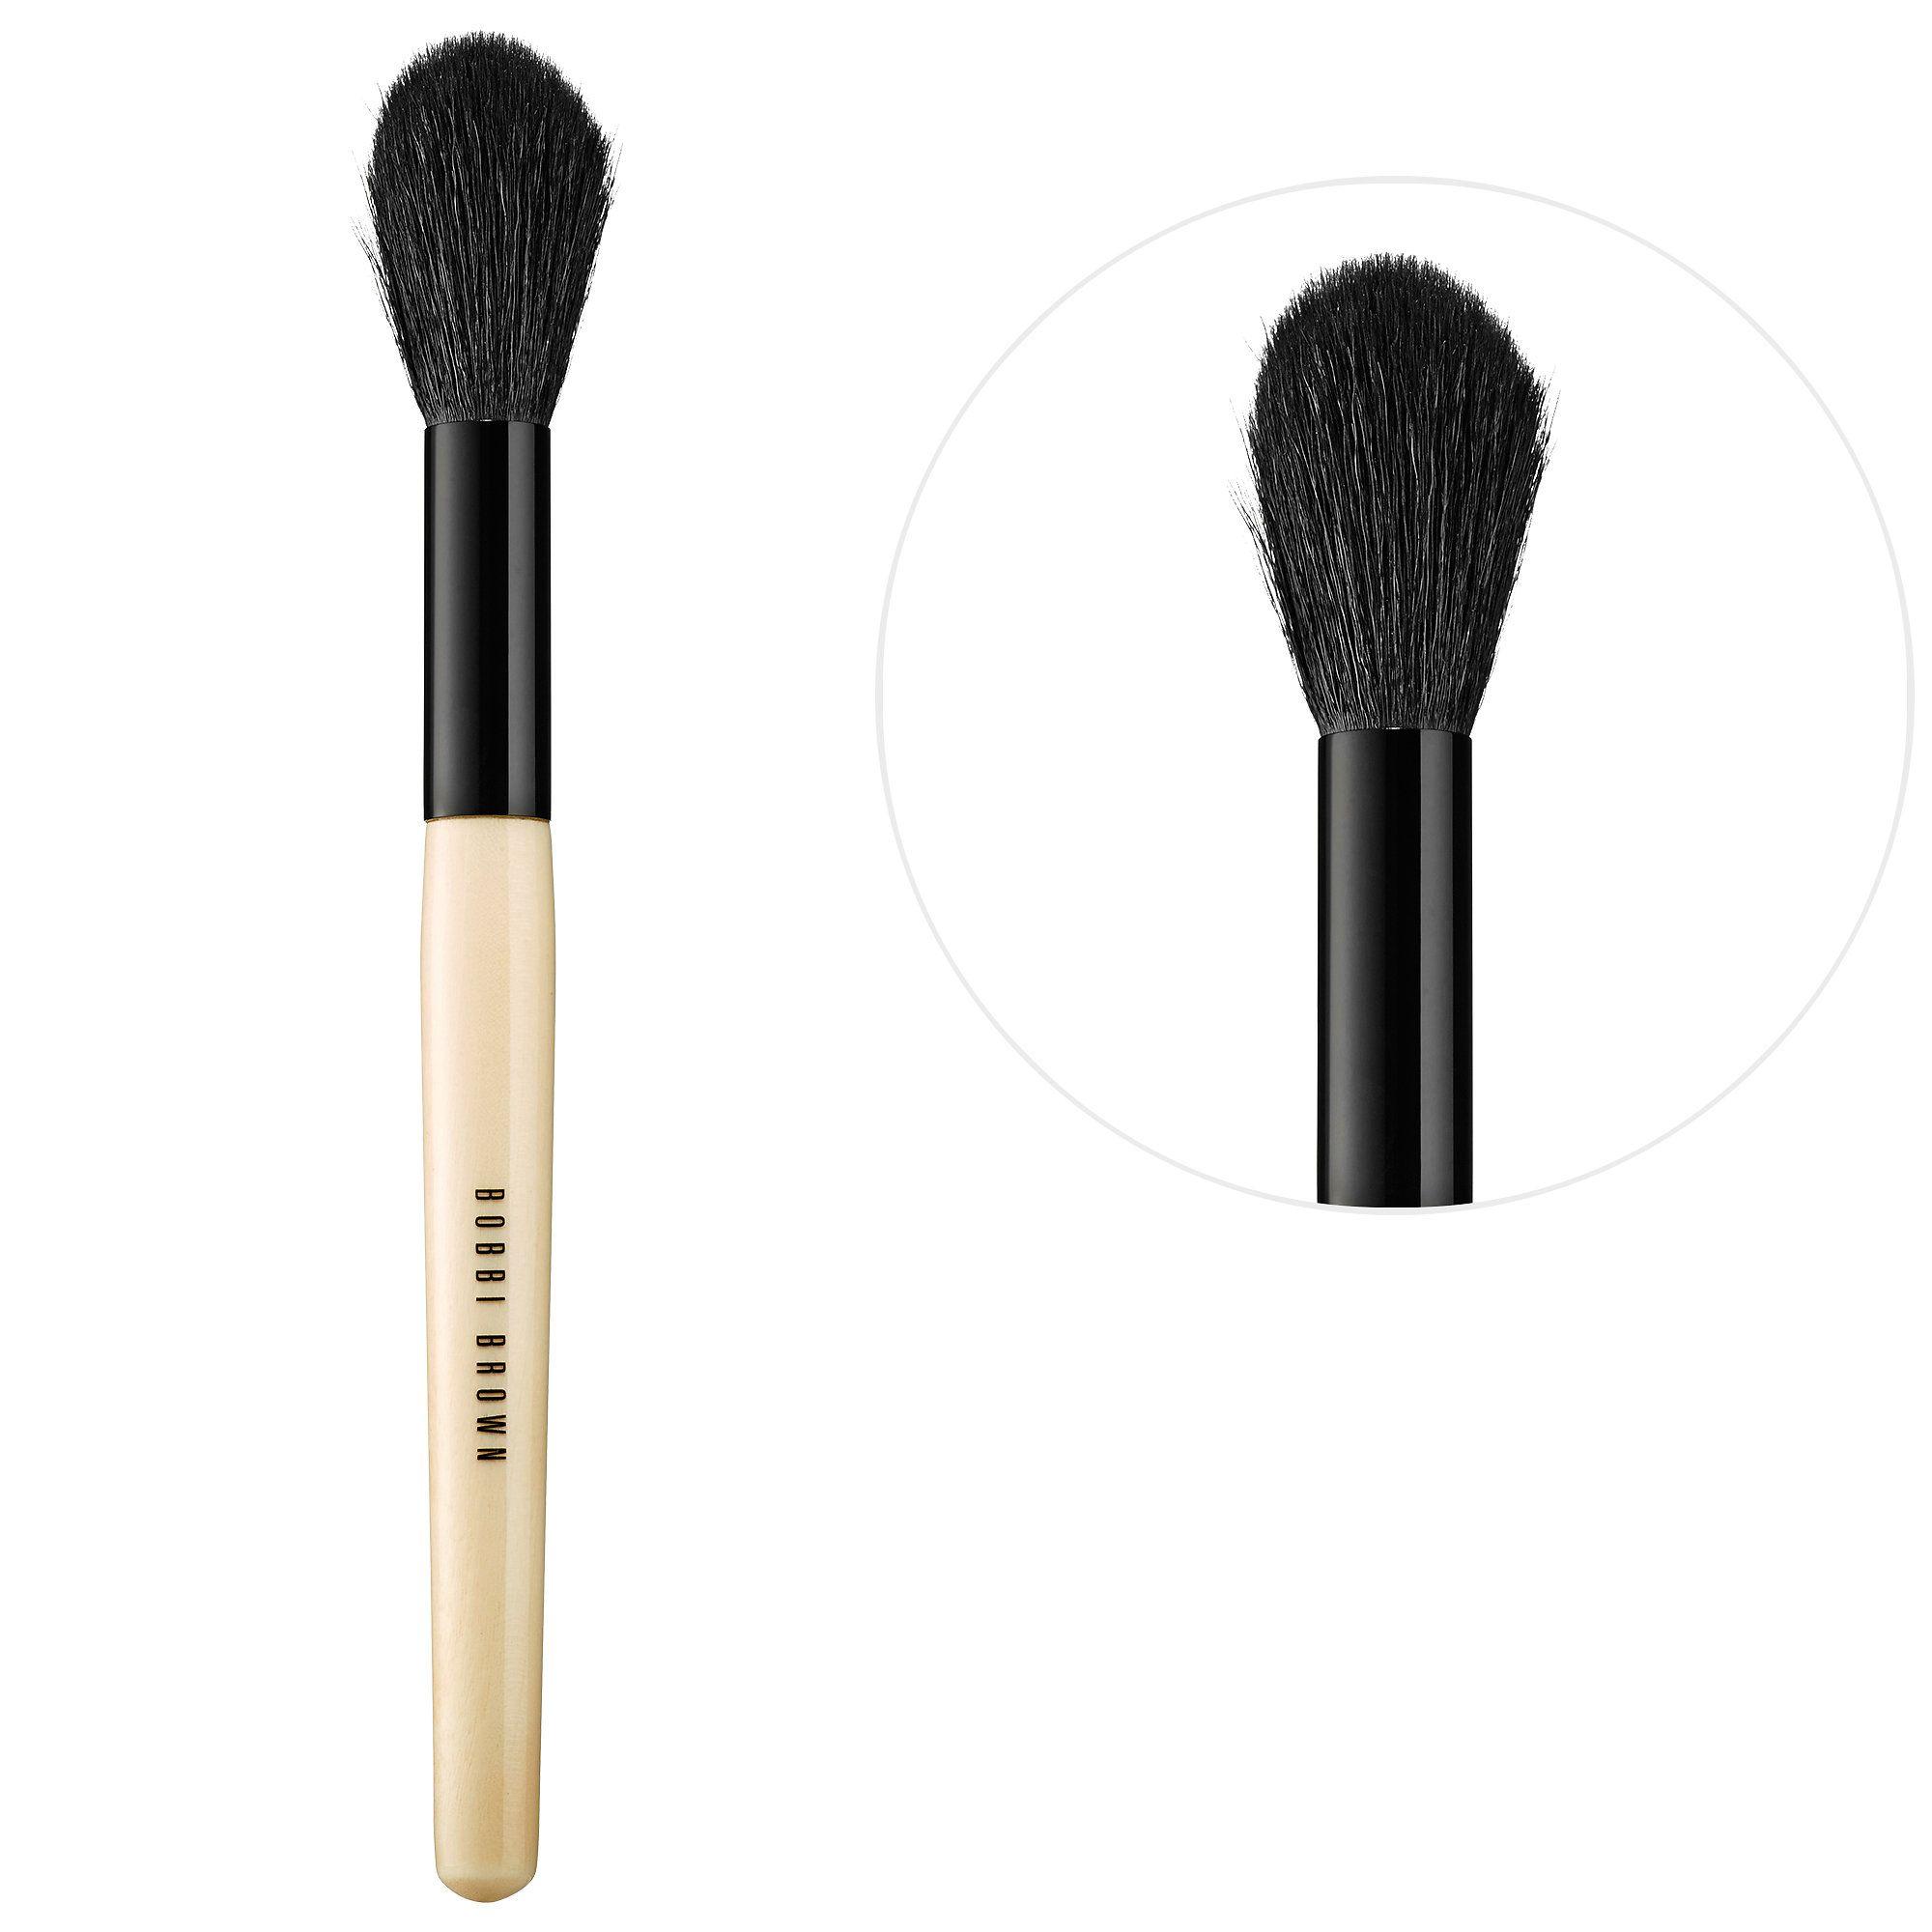 Sheer Powder Brush Bobbi Brown Sephora It cosmetics